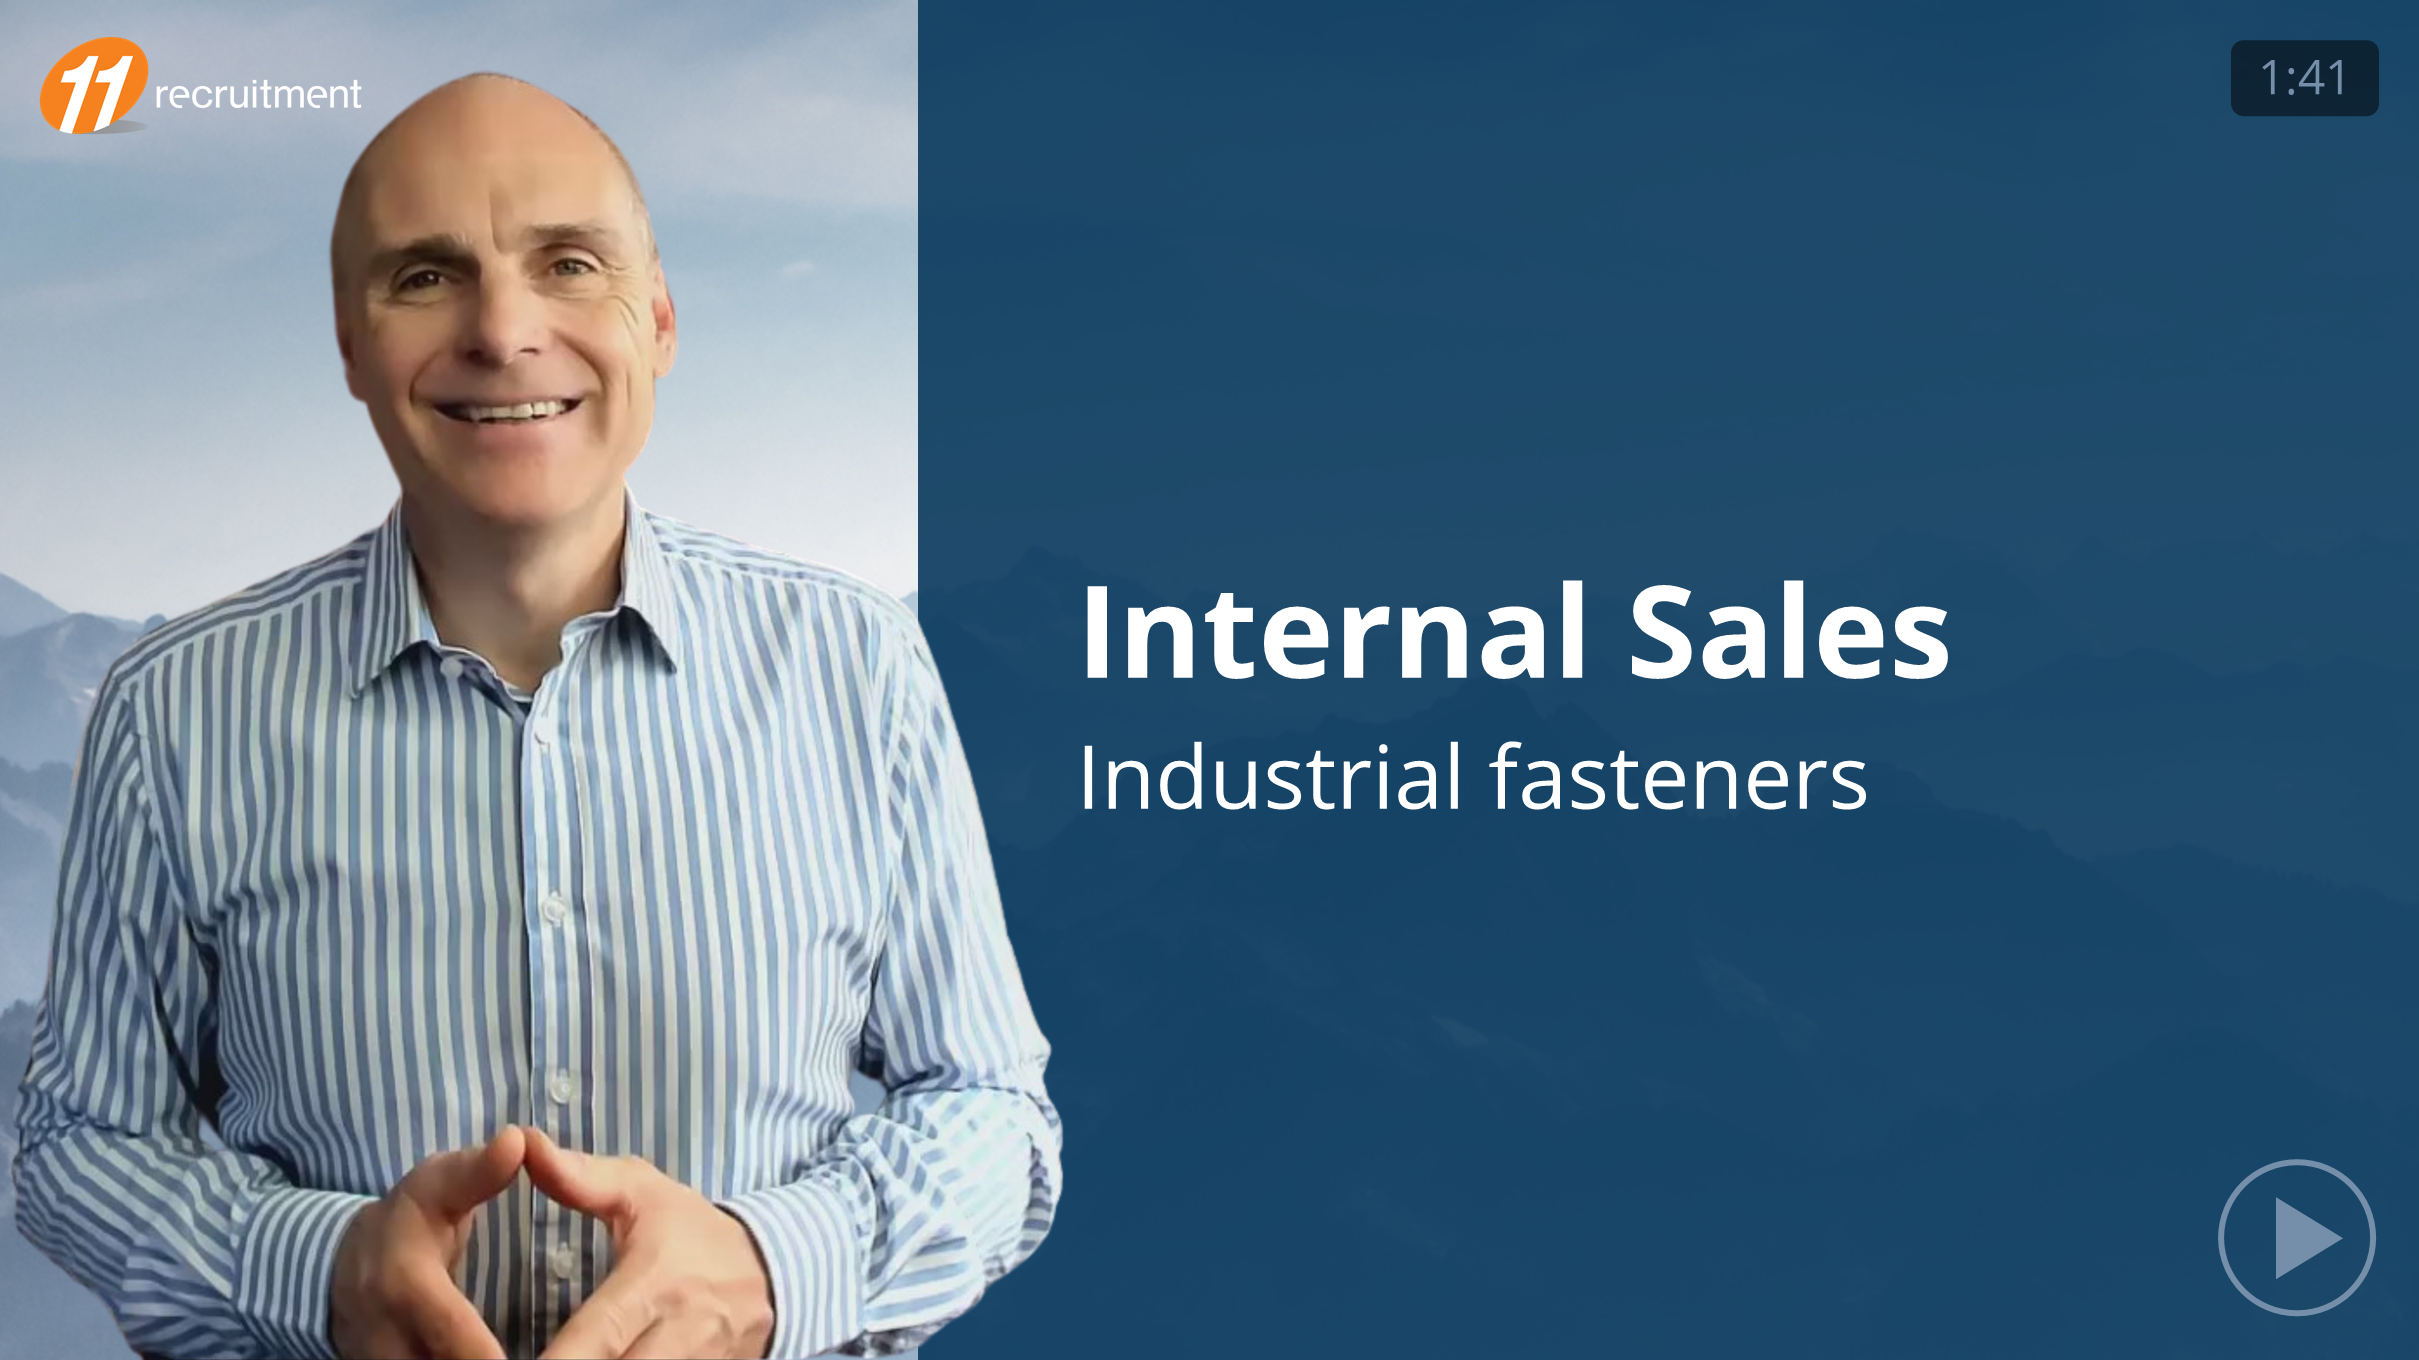 Internal Sales - Distribution